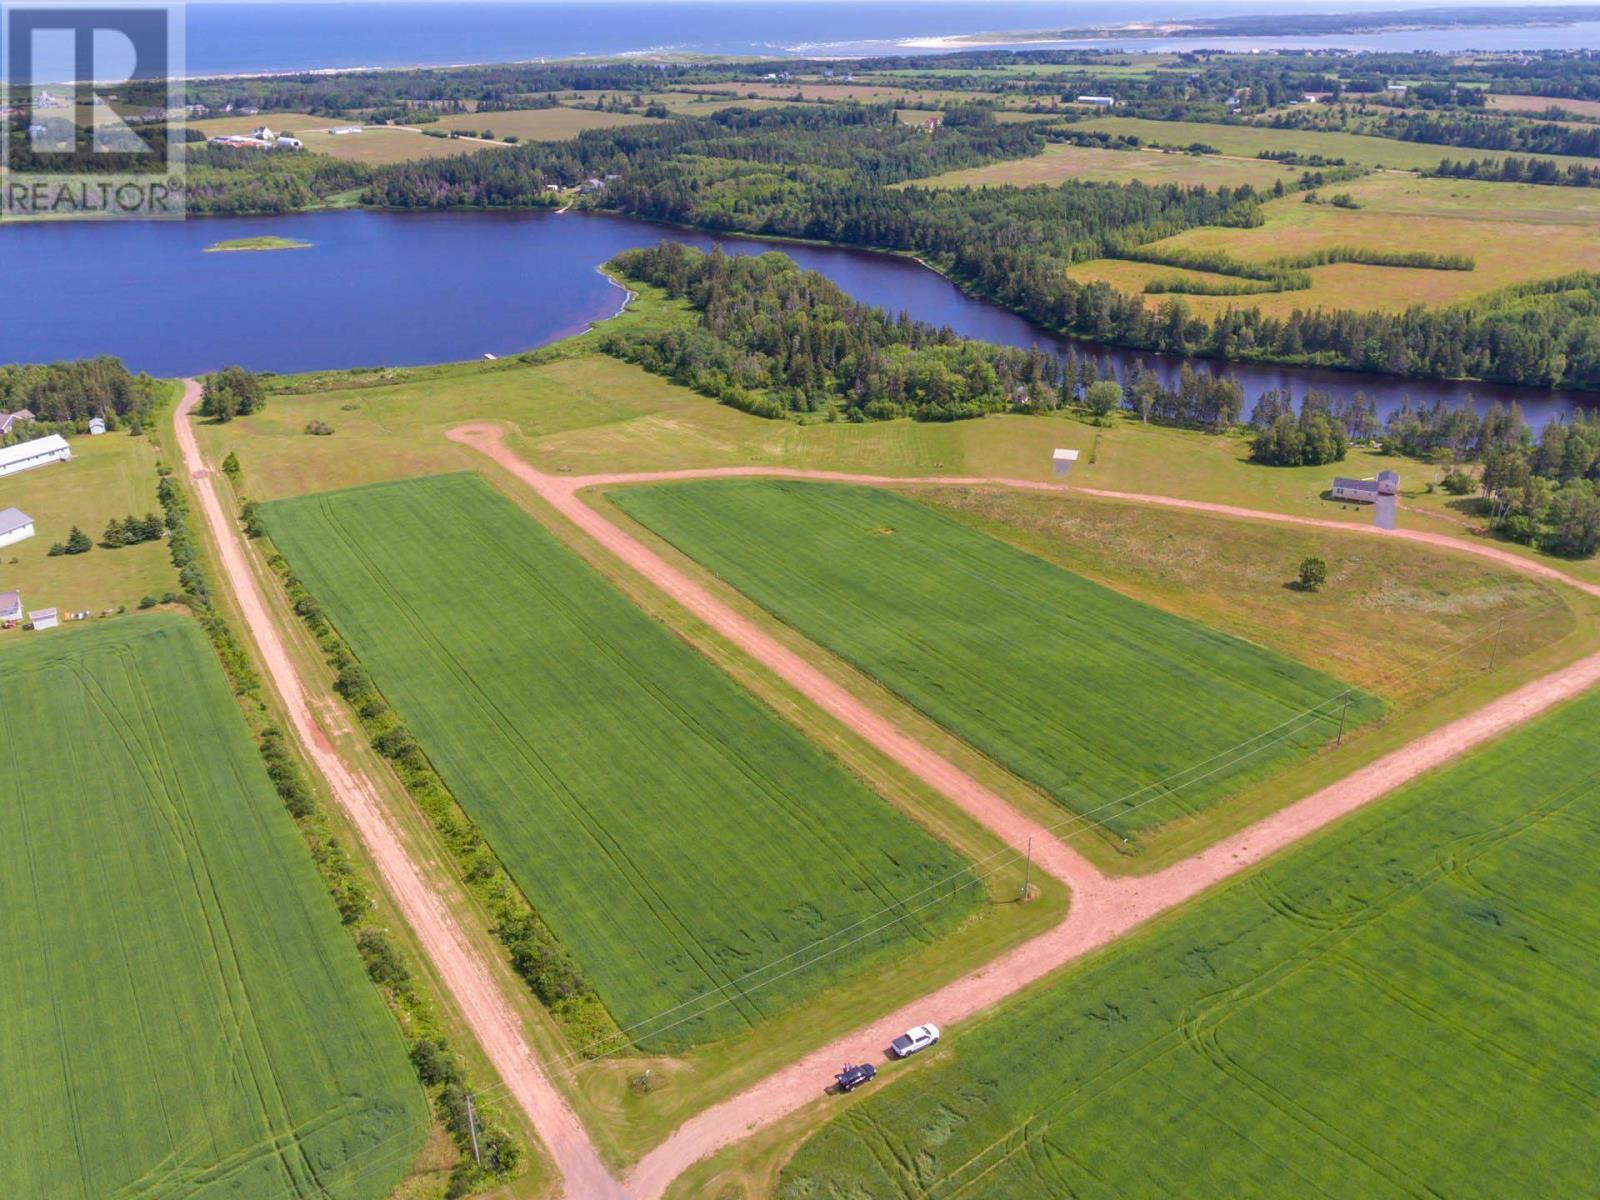 Lot 2 Majestic View Lane, Lakeside, Prince Edward Island  C0A 1S0 - Photo 1 - 202118512